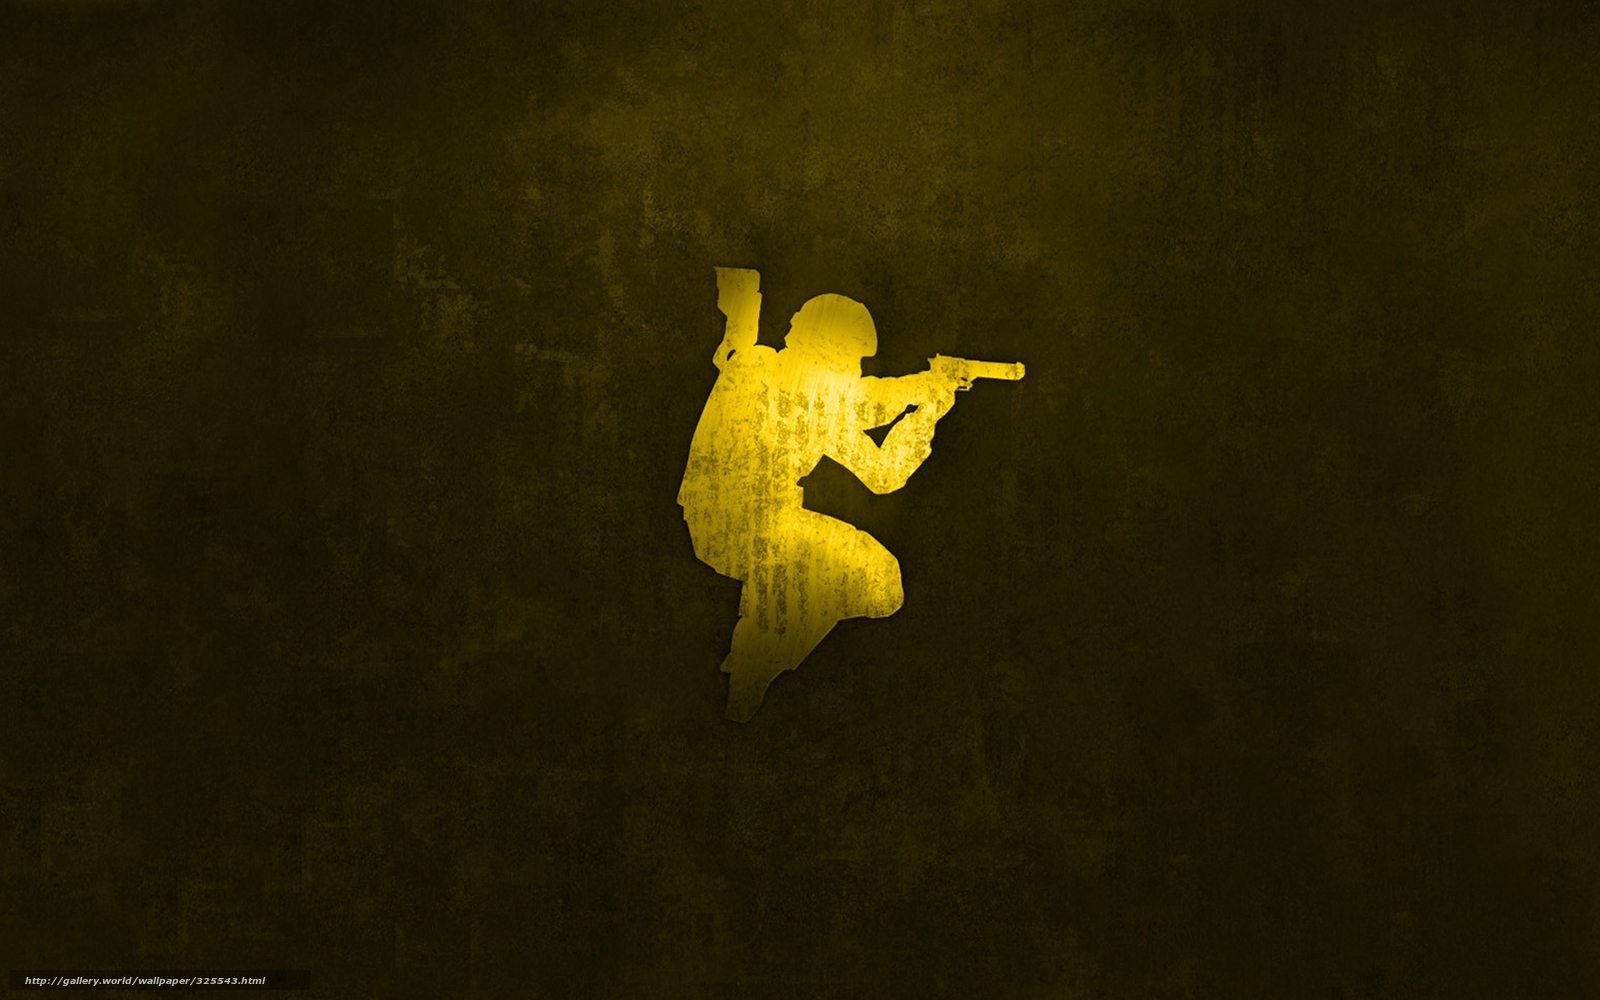 Download wallpaper kc gold Special Forces desktop wallpaper in 1600x1000